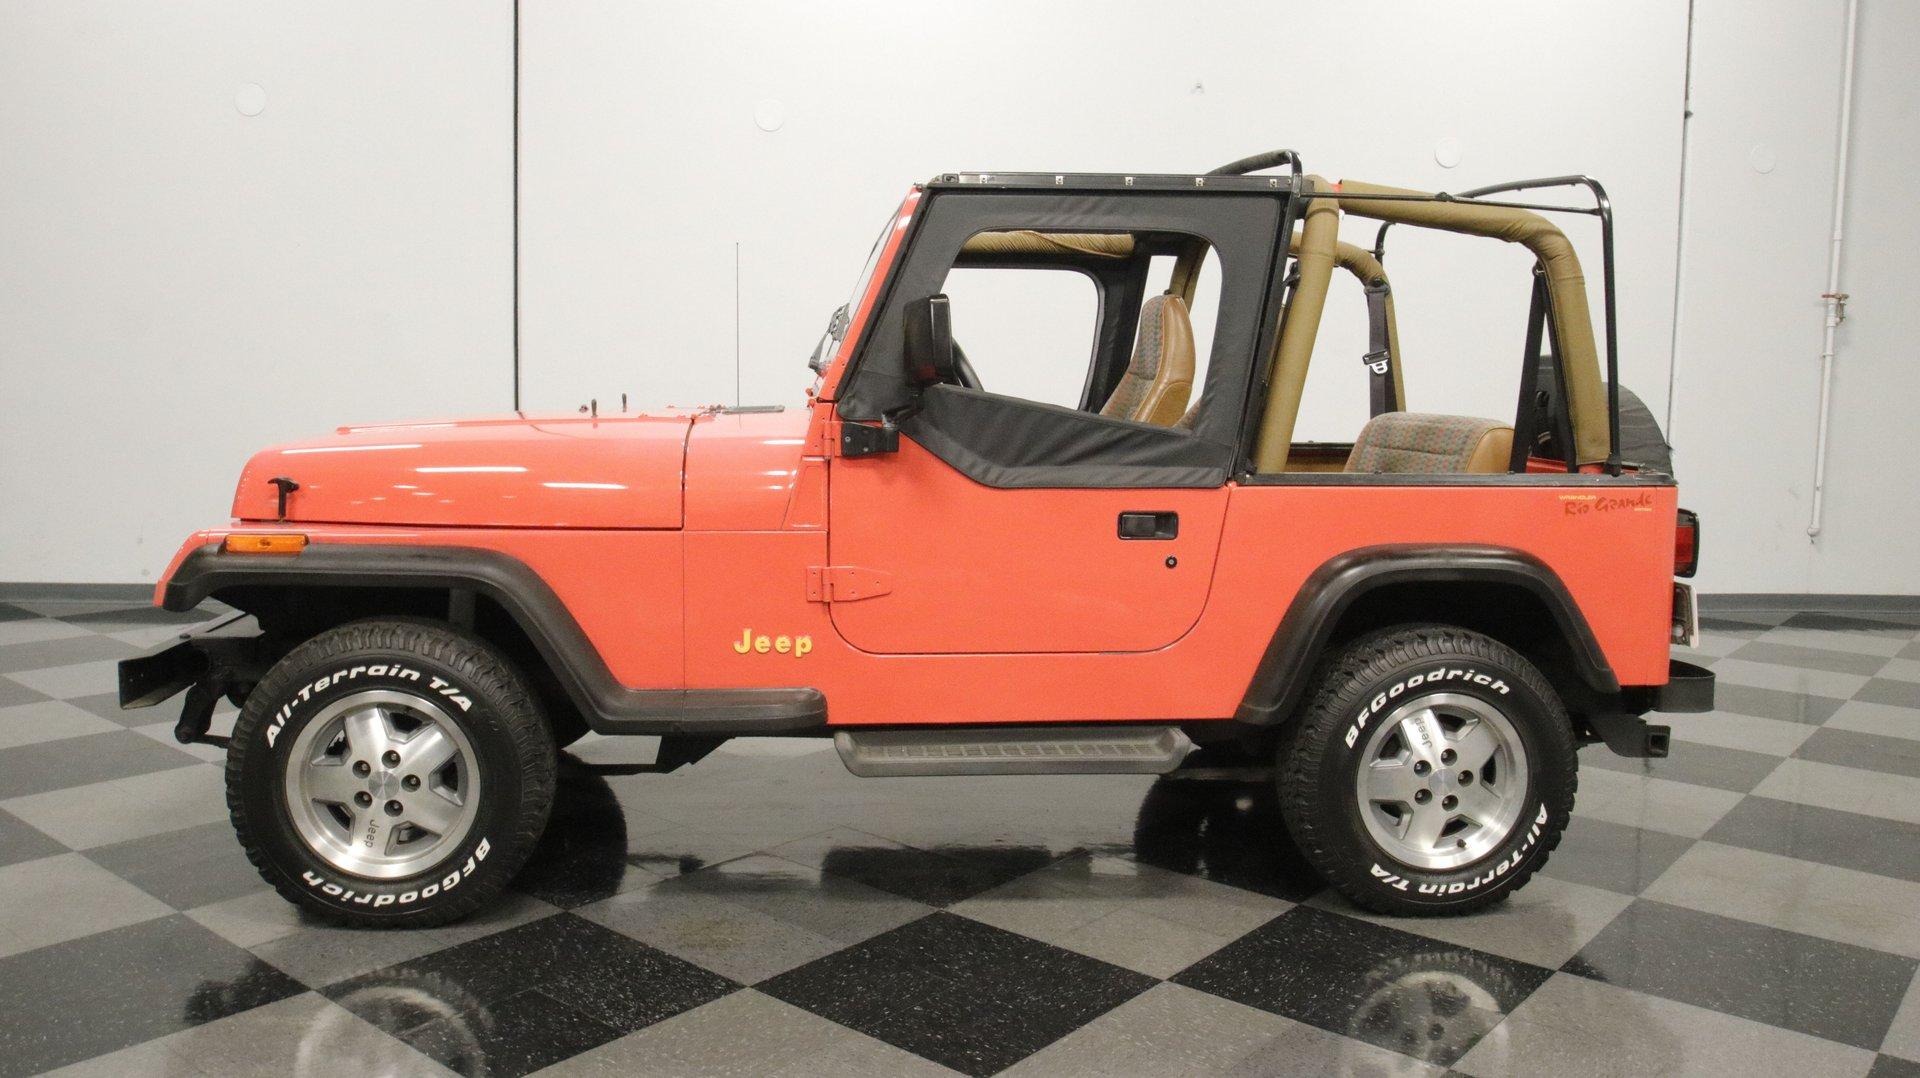 1995 jeep wrangler rio grande edition